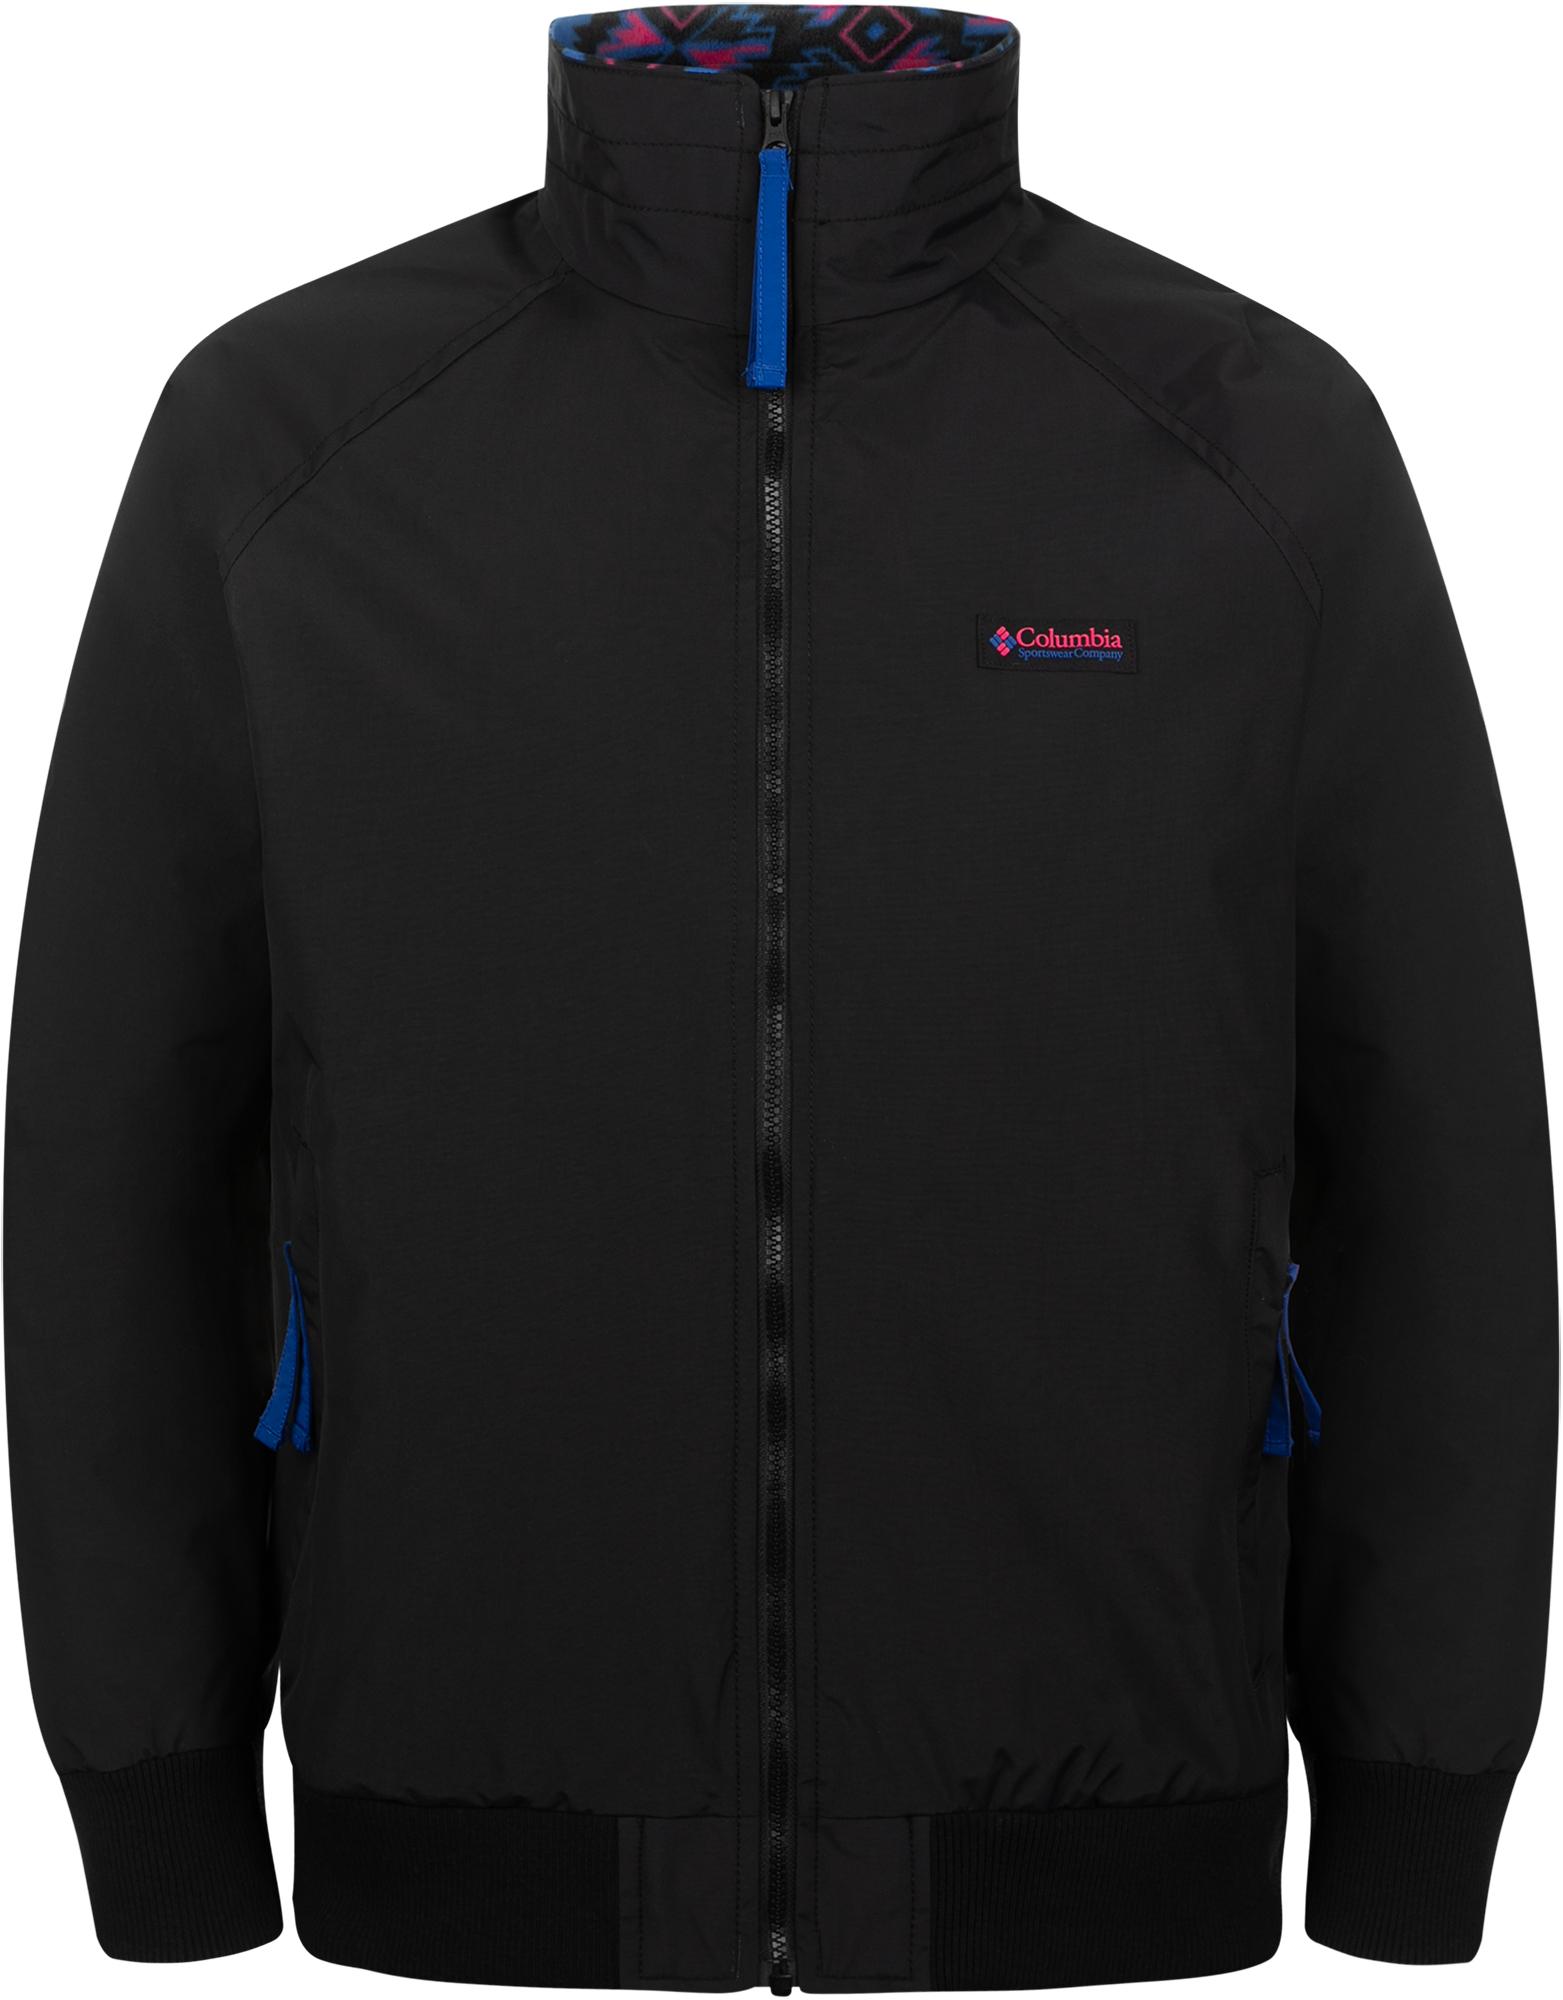 Columbia Куртка Columbia Falmouth™, размер 54 columbia куртка columbia falmouth™ размер 48 50